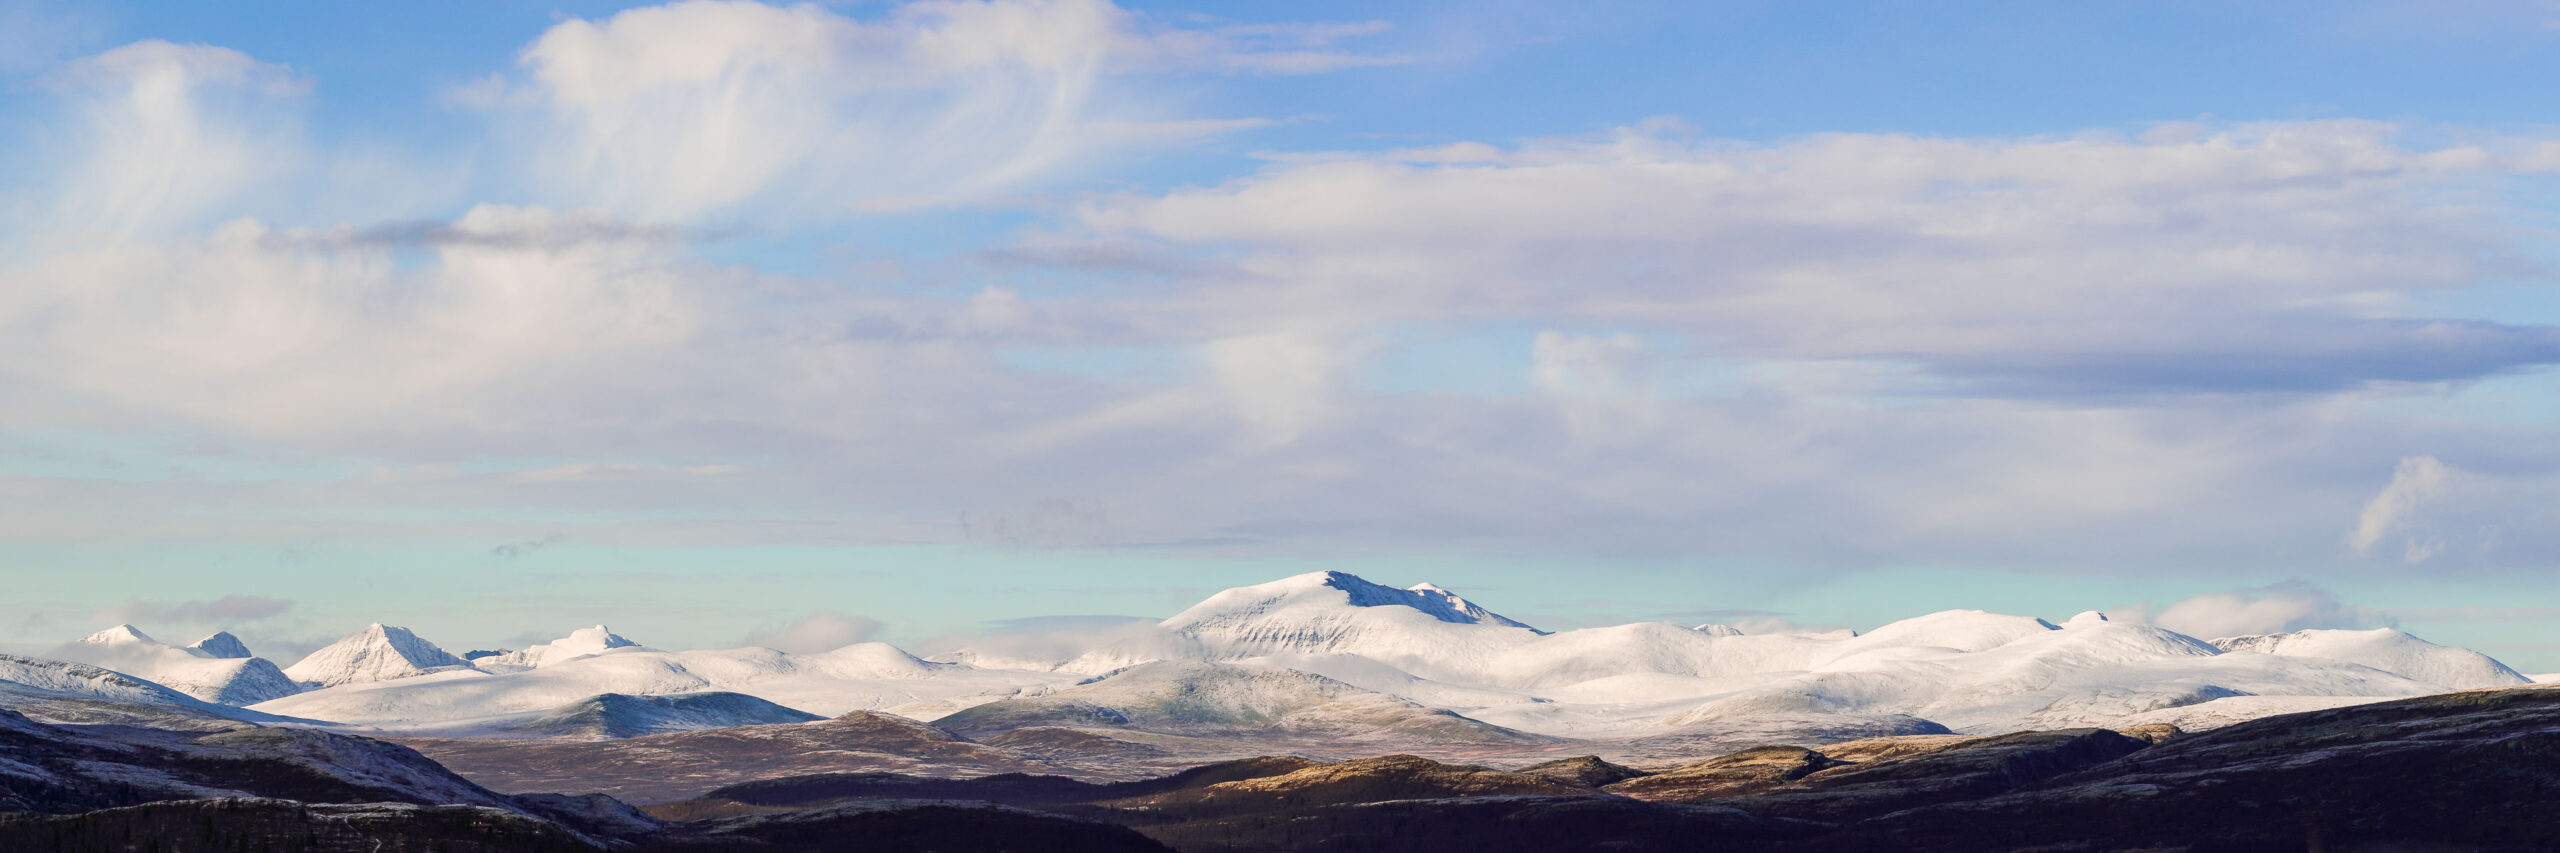 Venabygdsfjellet Norway